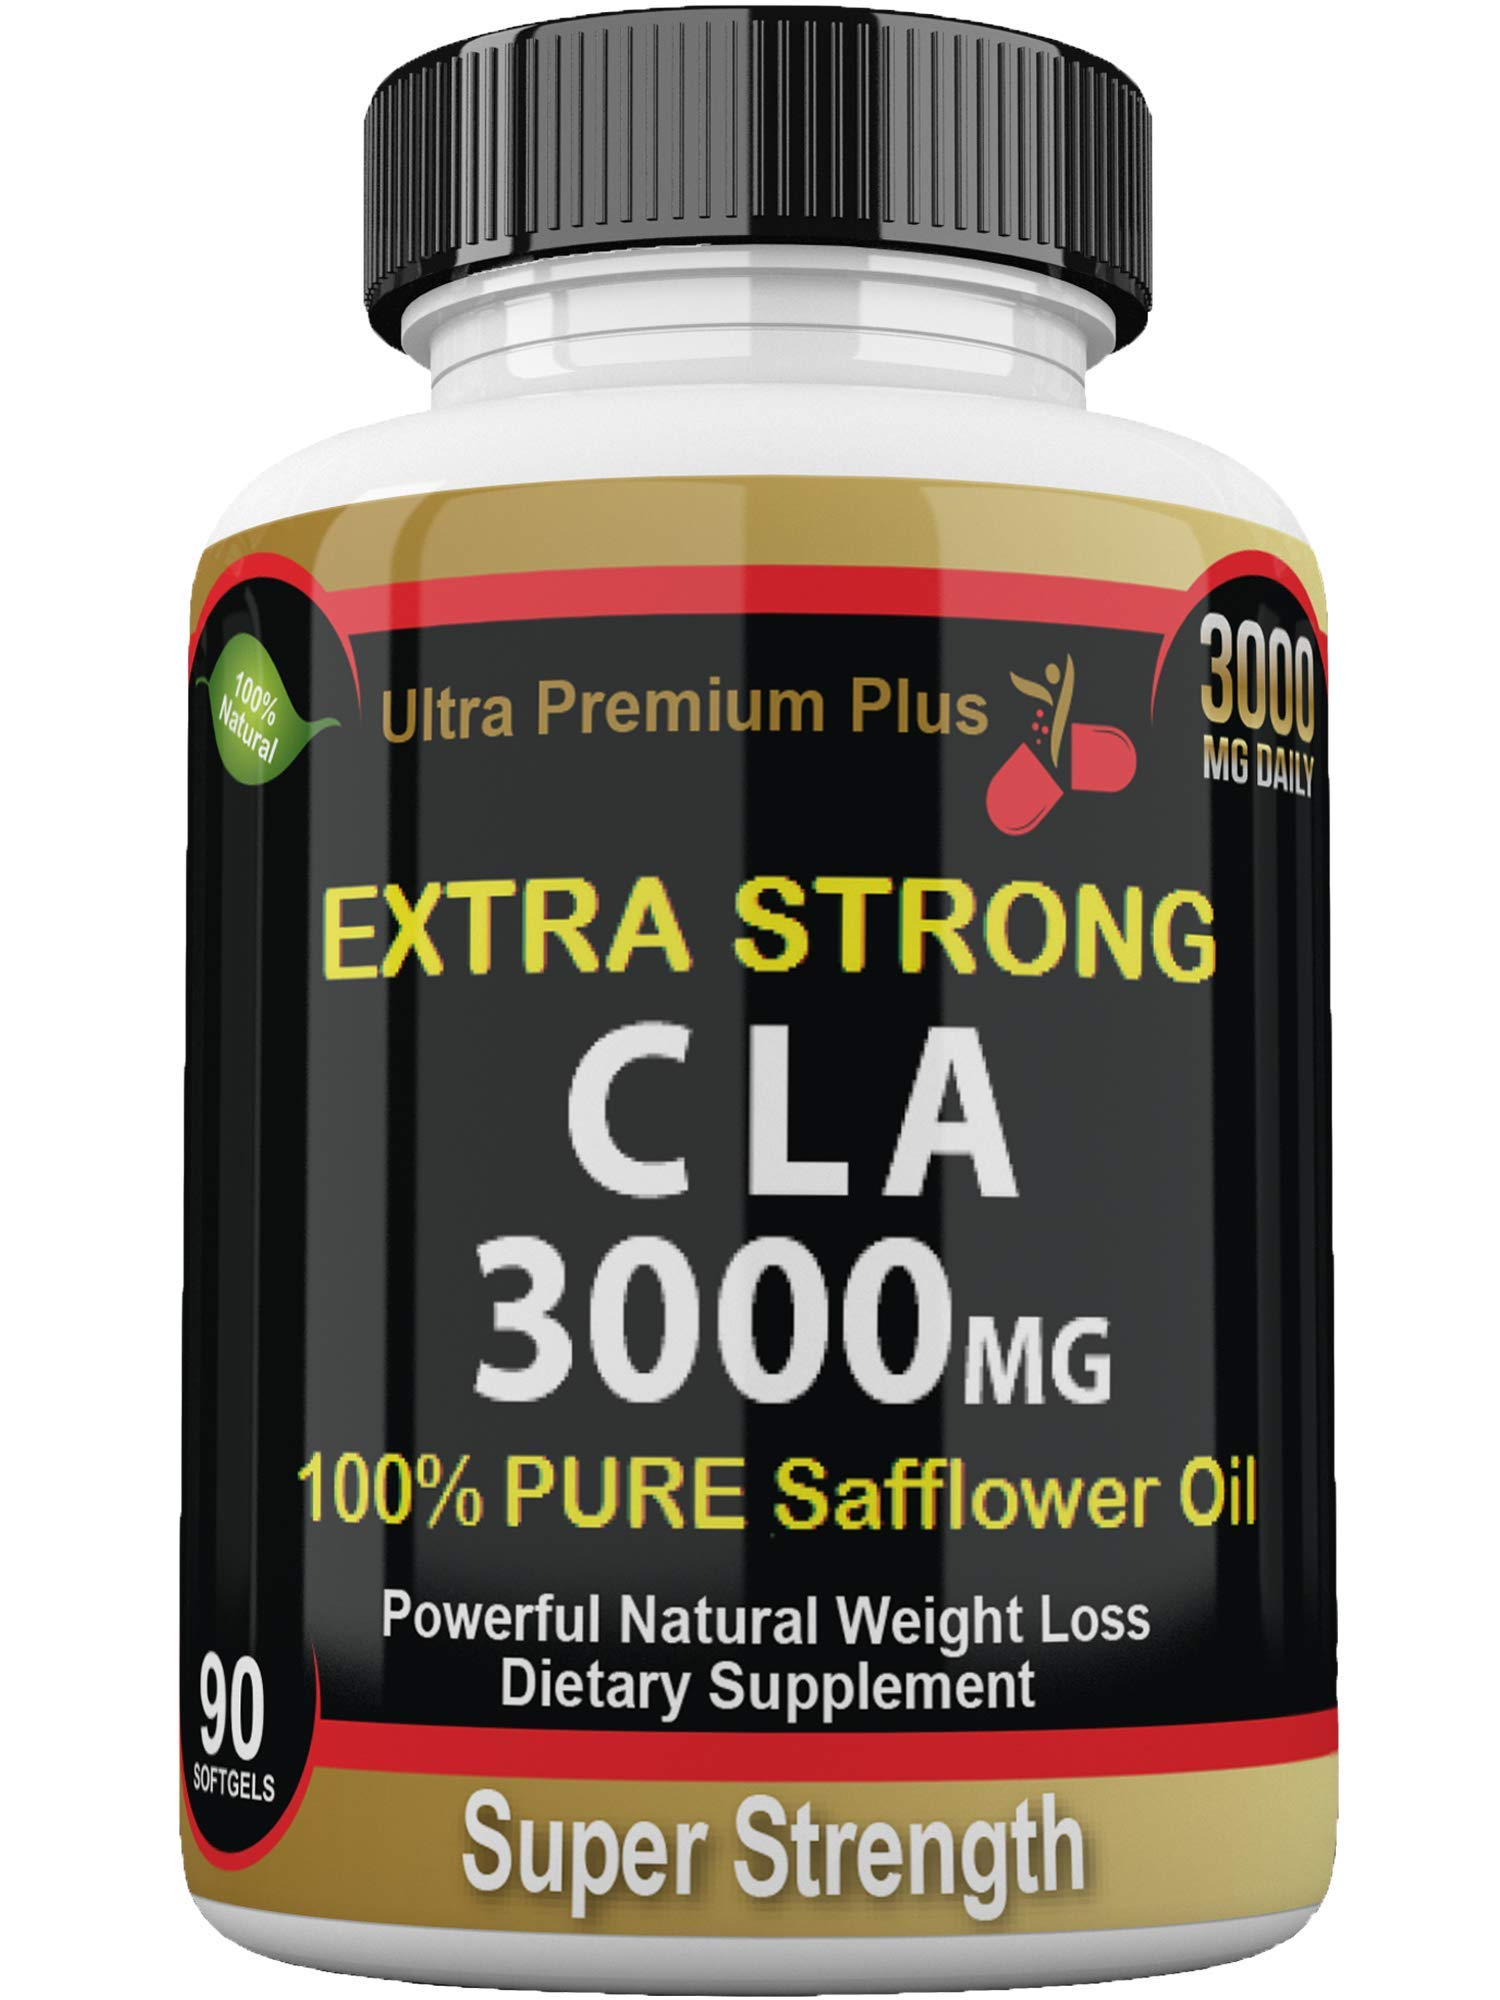 CLA 3000mg Super Strength Ultra Premium Plus. Highest Potency Conjugated Linoleic Acid Softgel. Pure 100% Safflower Oil, Best Weight Loss, Fat Burner, Body Enhancement, Supplement